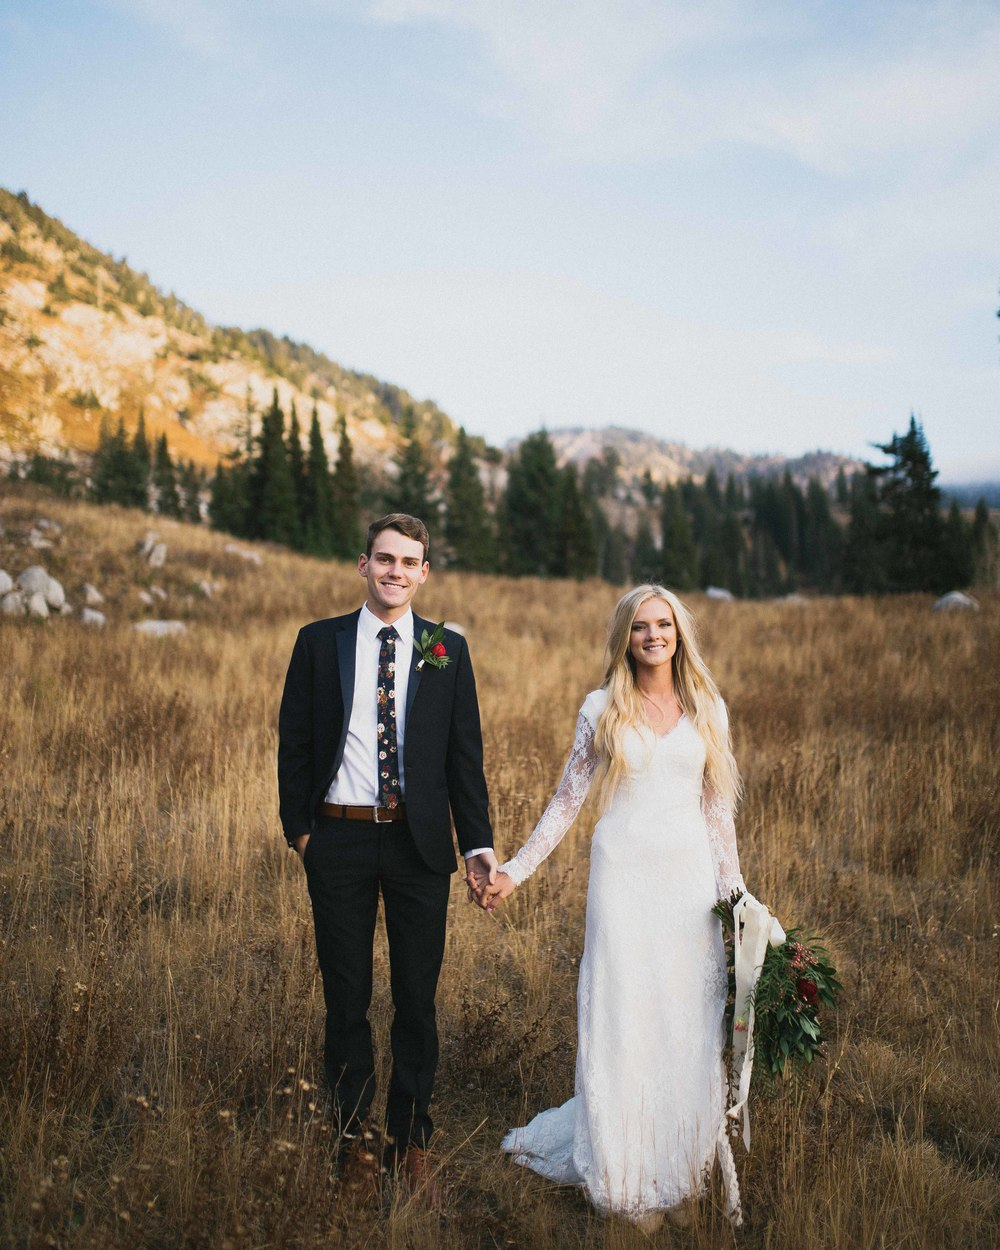 salt-lake-city-wedding-photographer-24.jpg